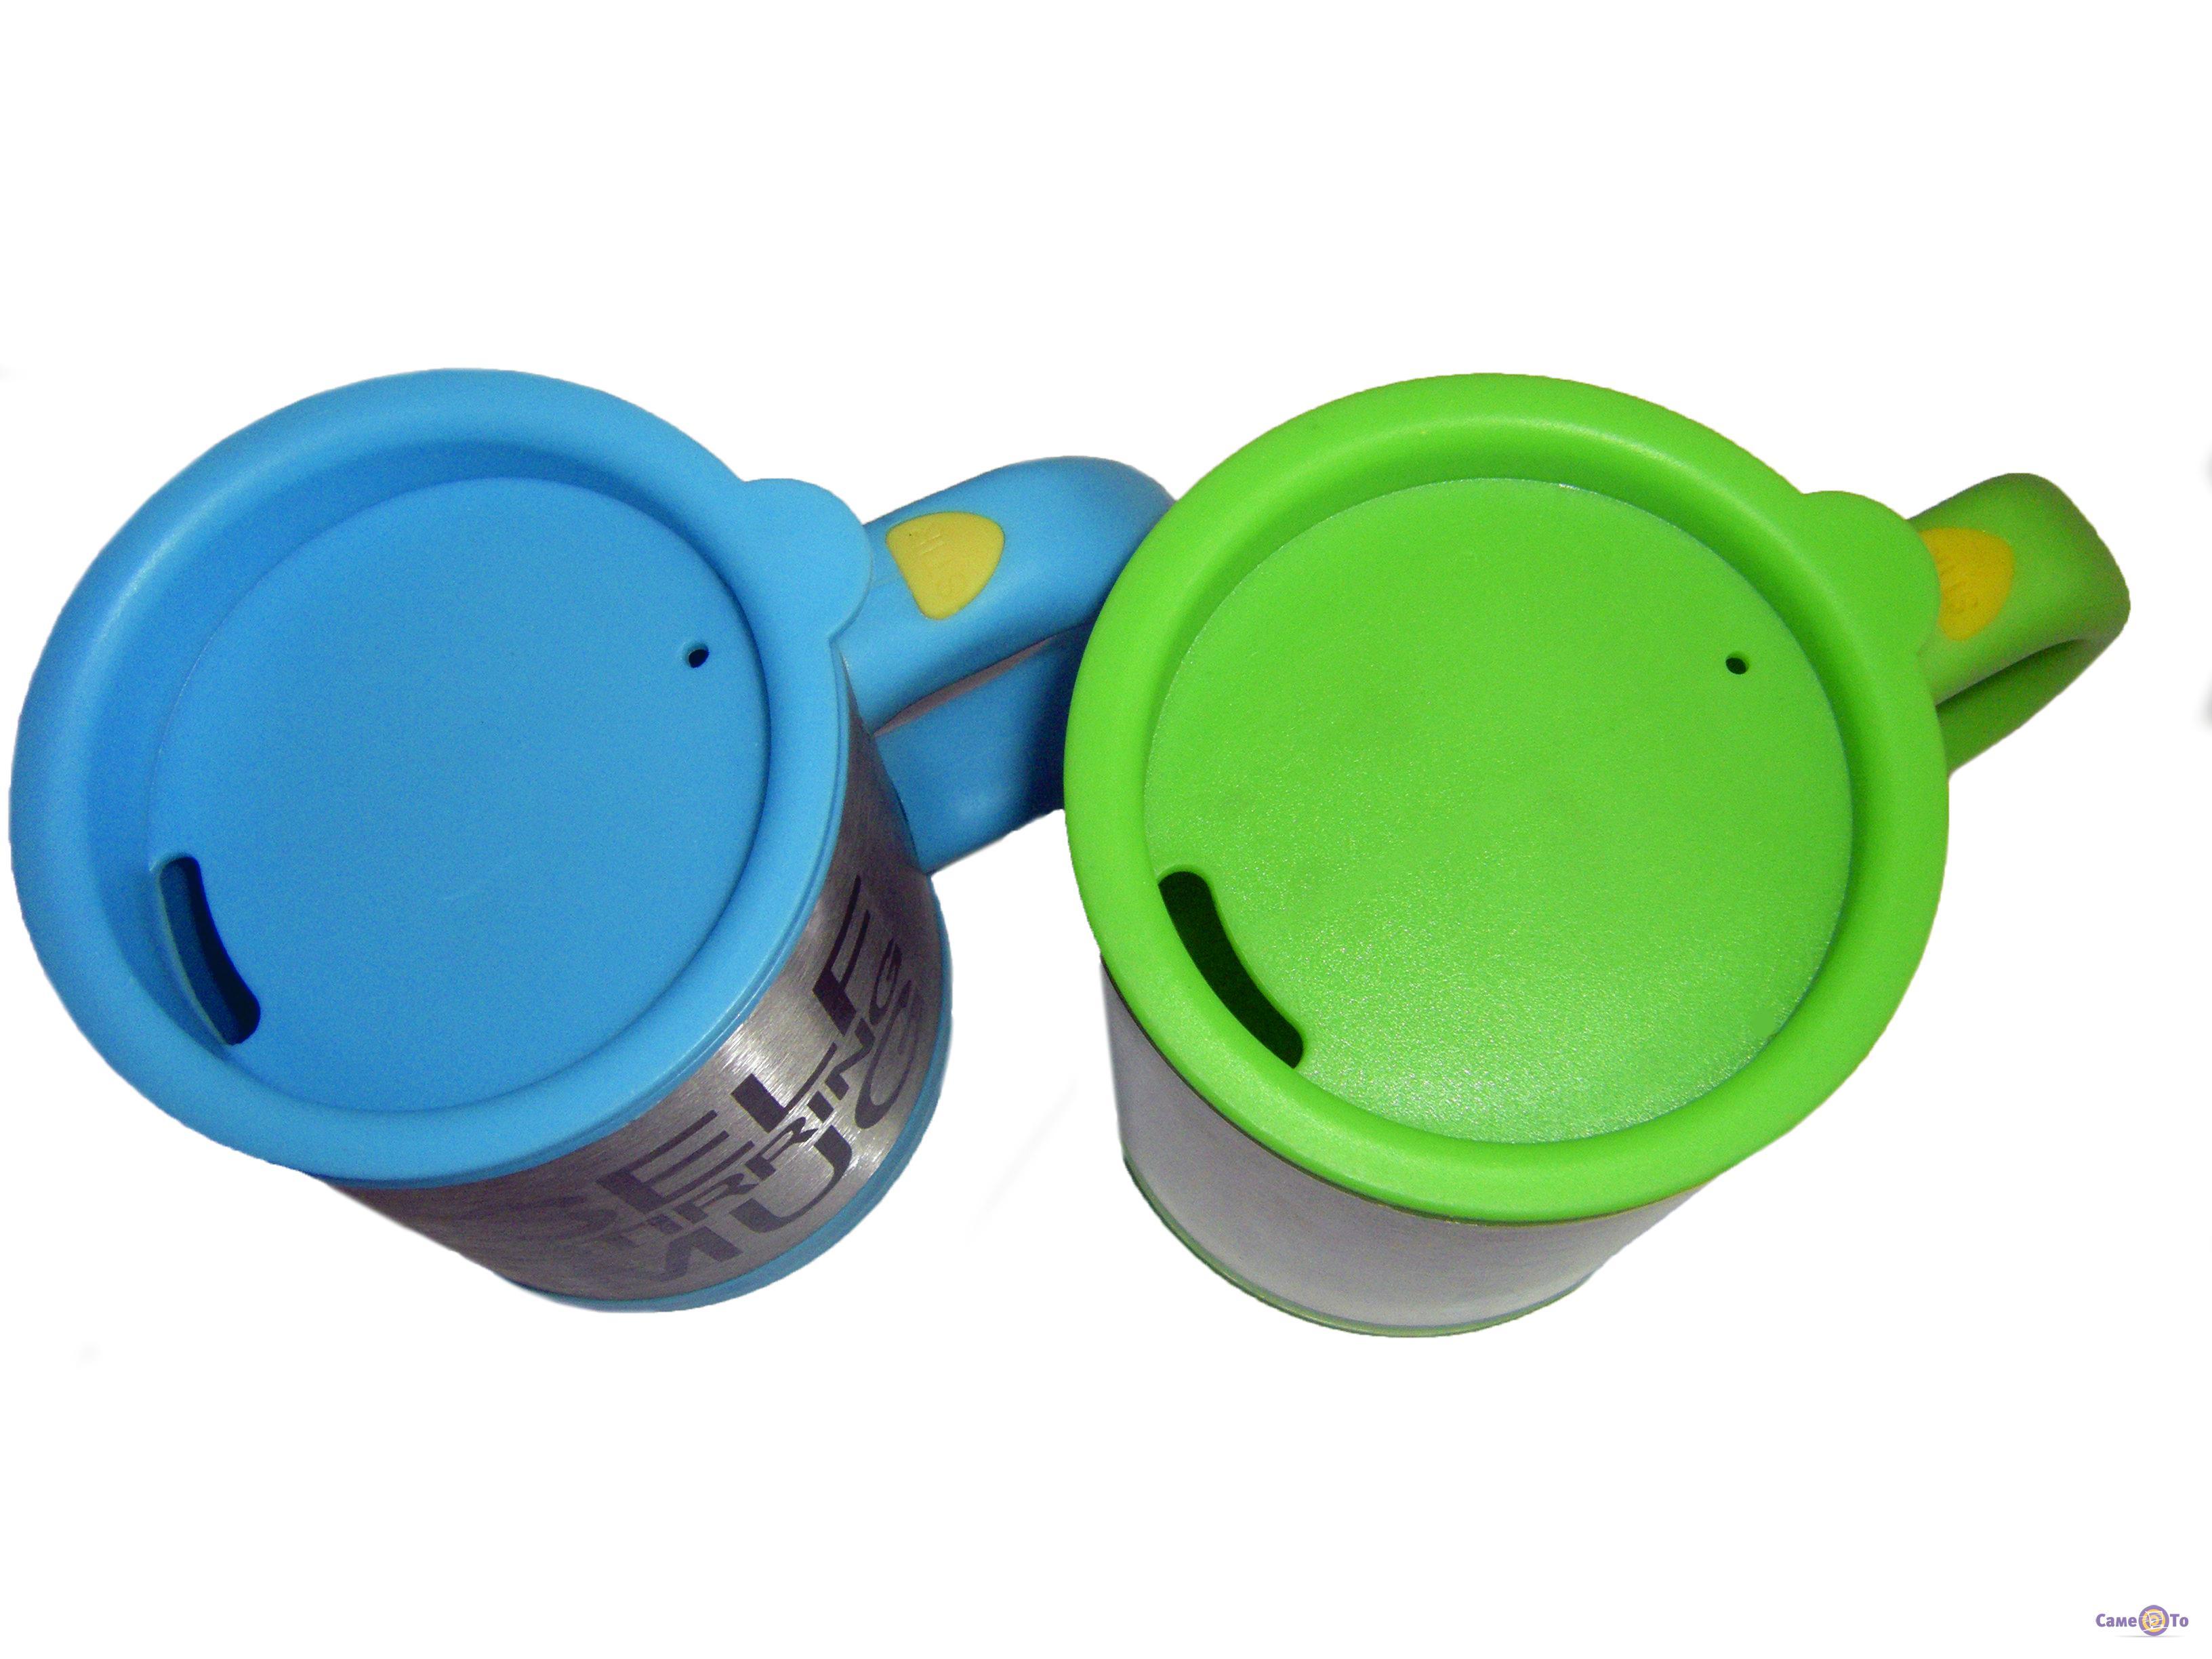 Кружка-мешалка «Self stirring mug» - саморазмешивающая кружка